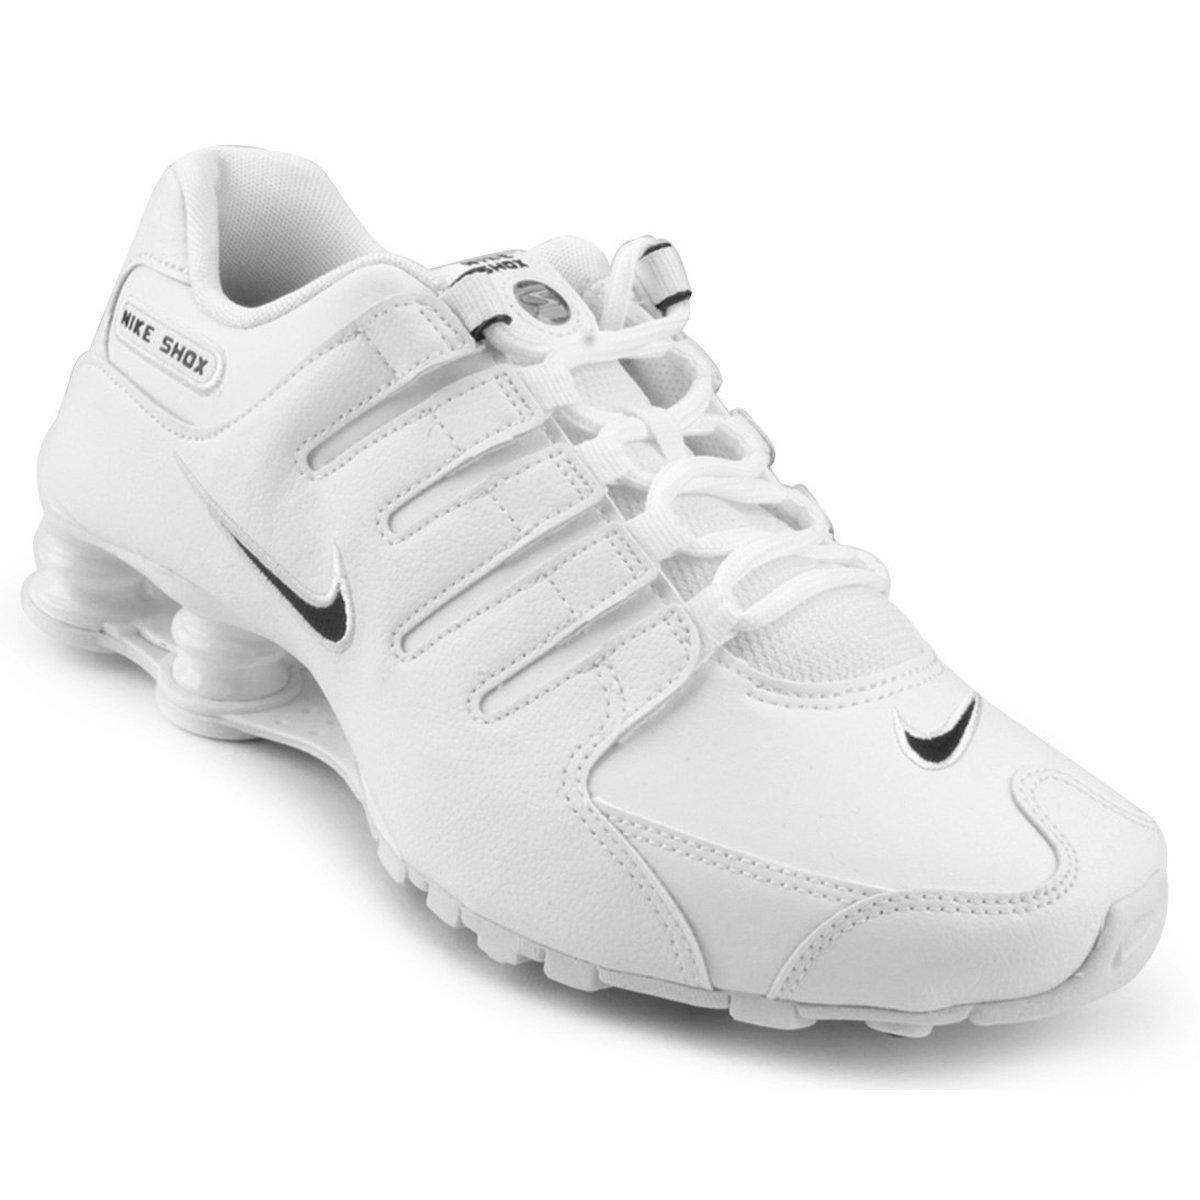 33d9f3d91ea Tênis Masculino Nike Shox NZ EU 501524-106 - Branco Preto - Calçados ...